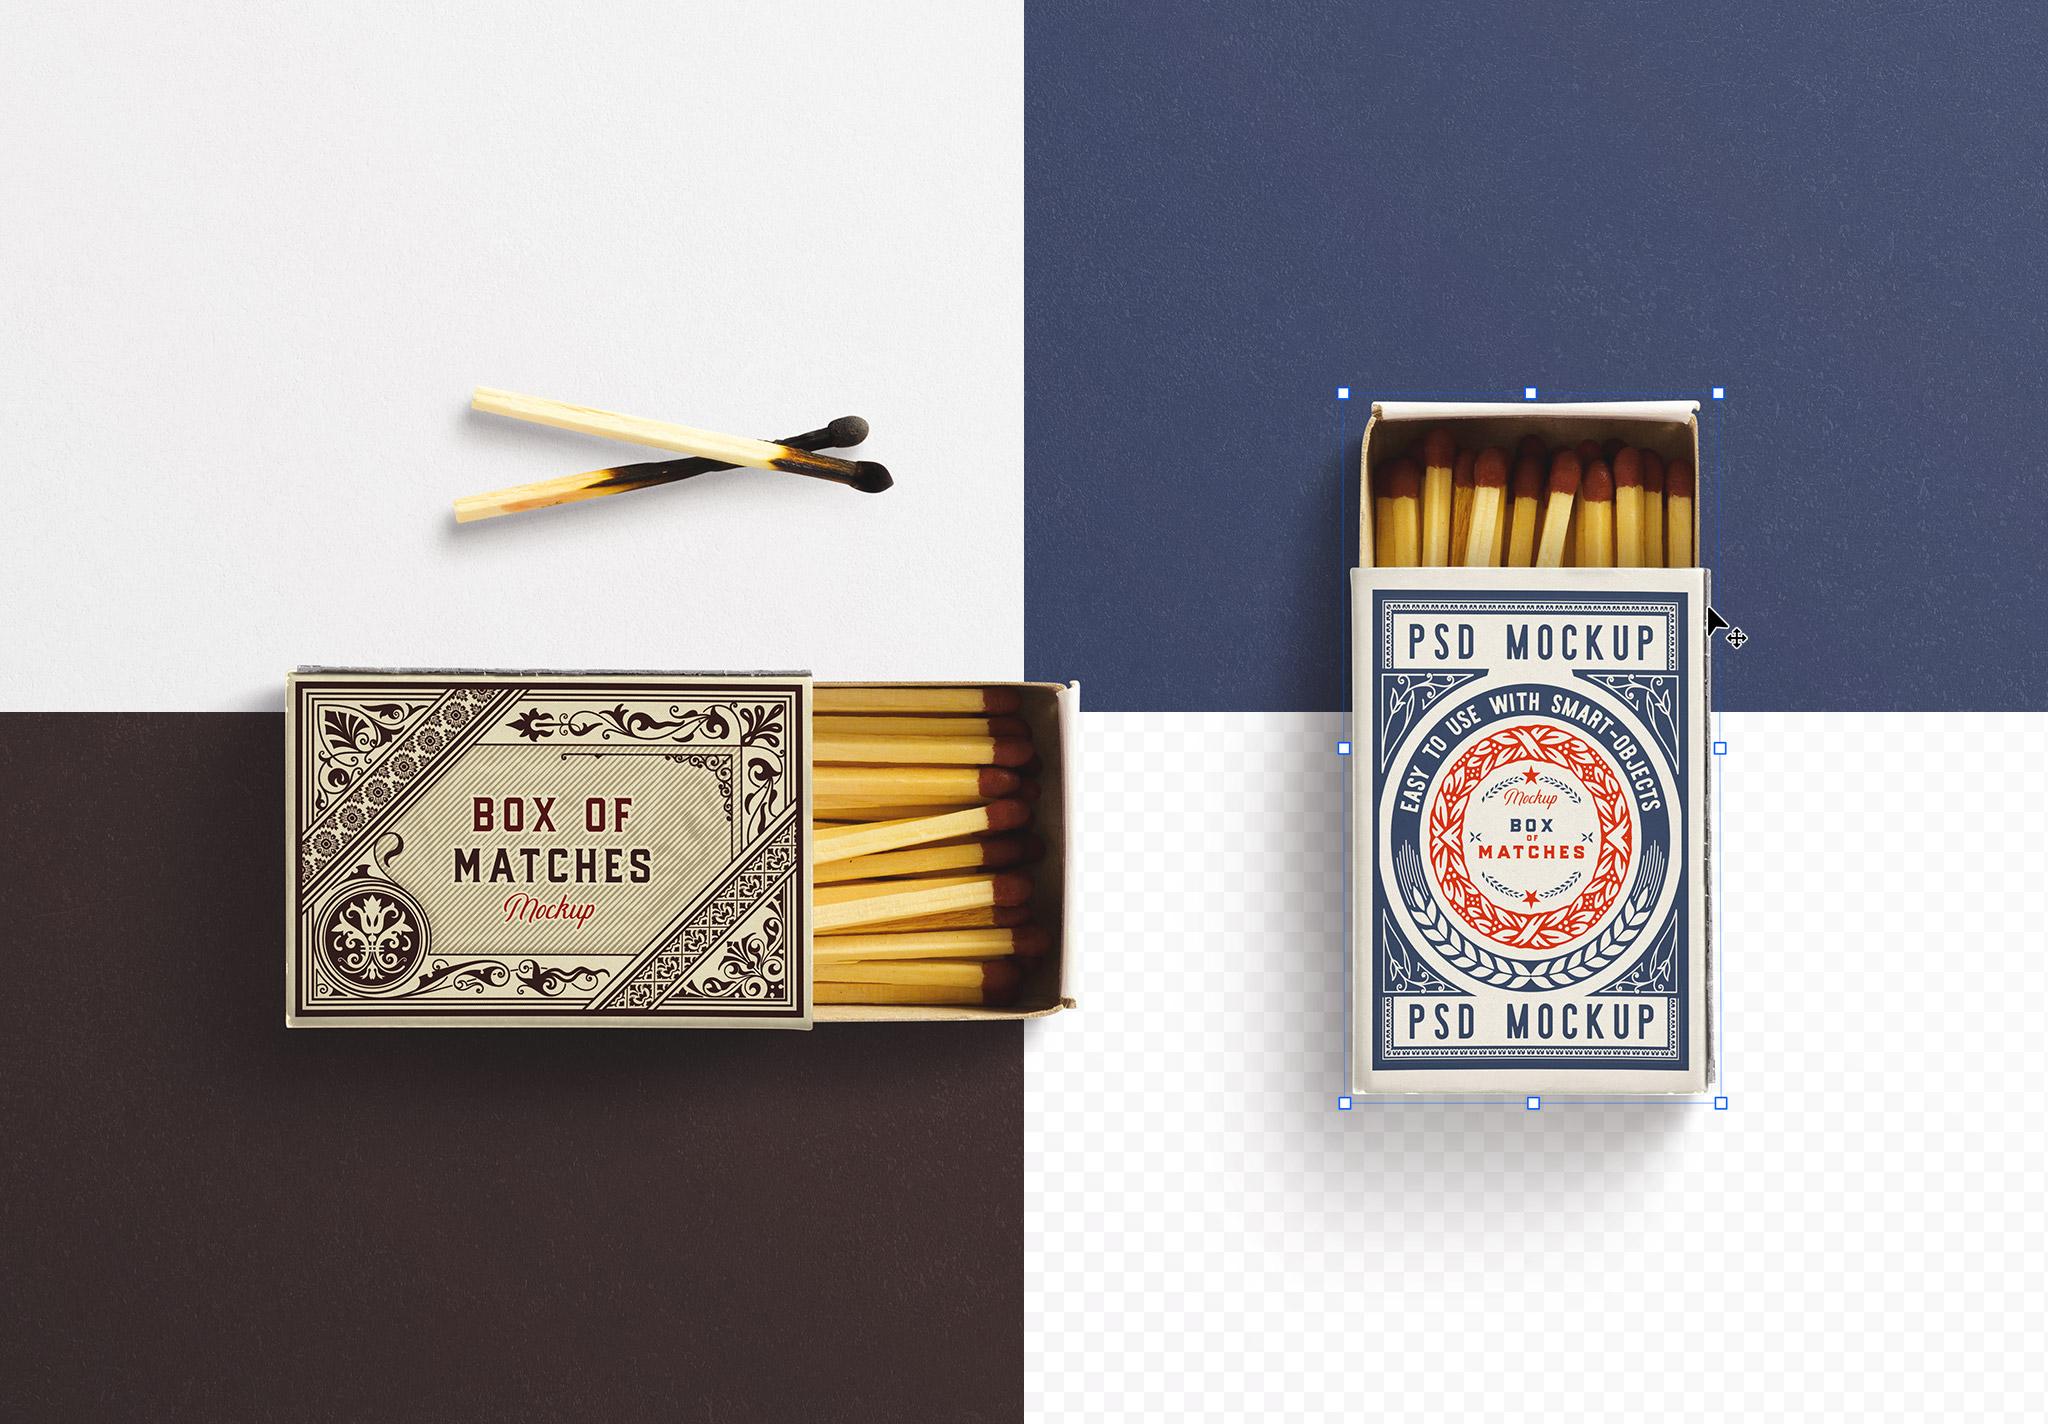 Open Box Matches Mockup image02